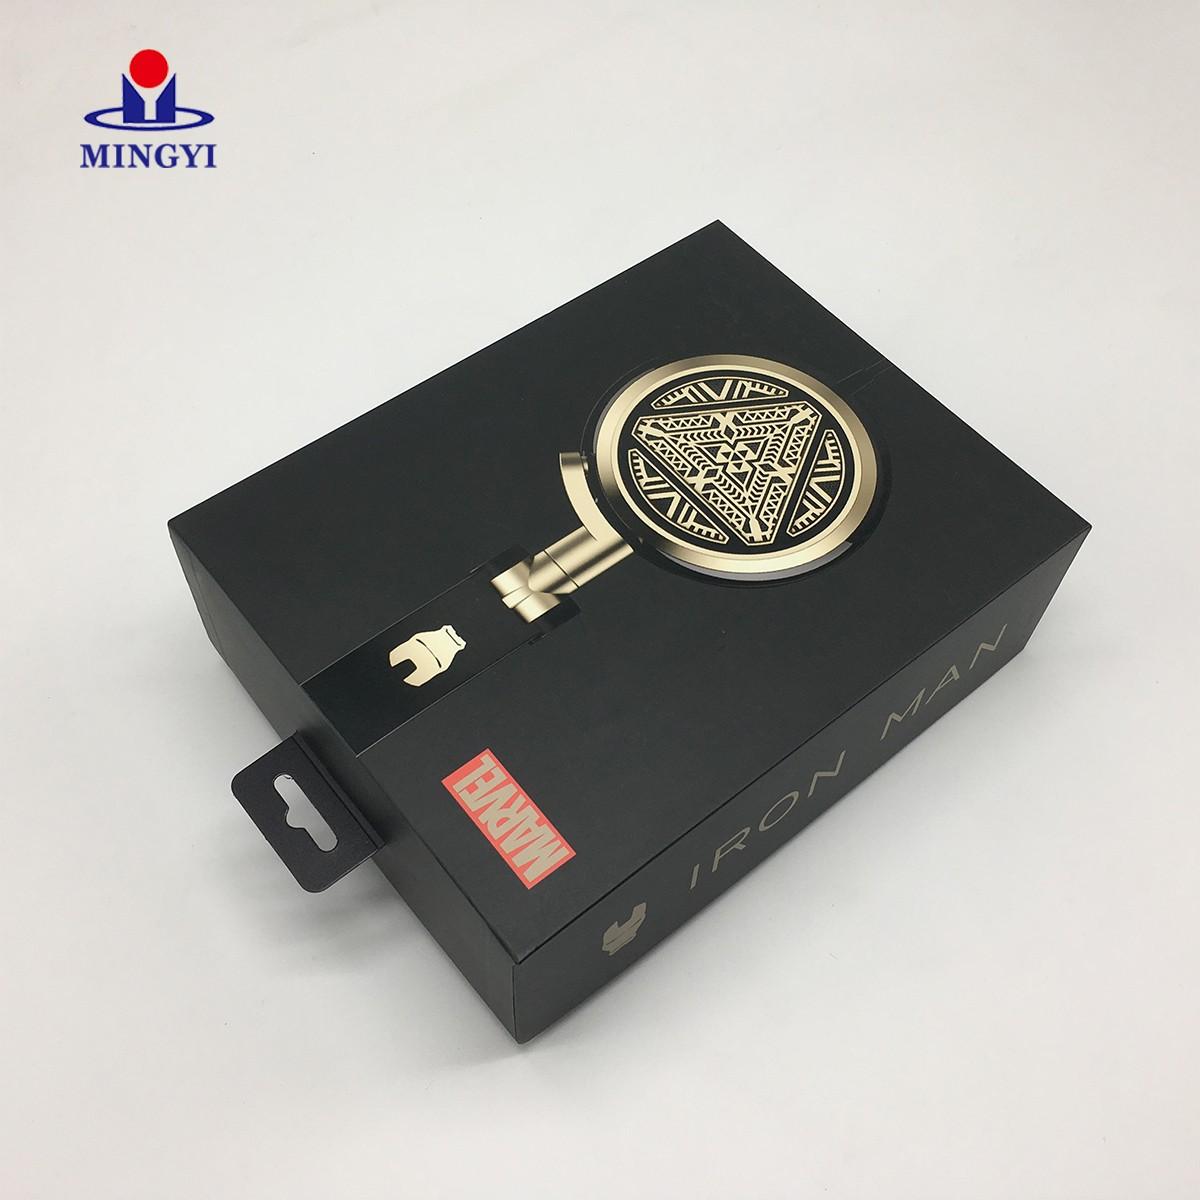 news-Mingyi Printing-New custom design Iron man style headphones packaging box-img-2